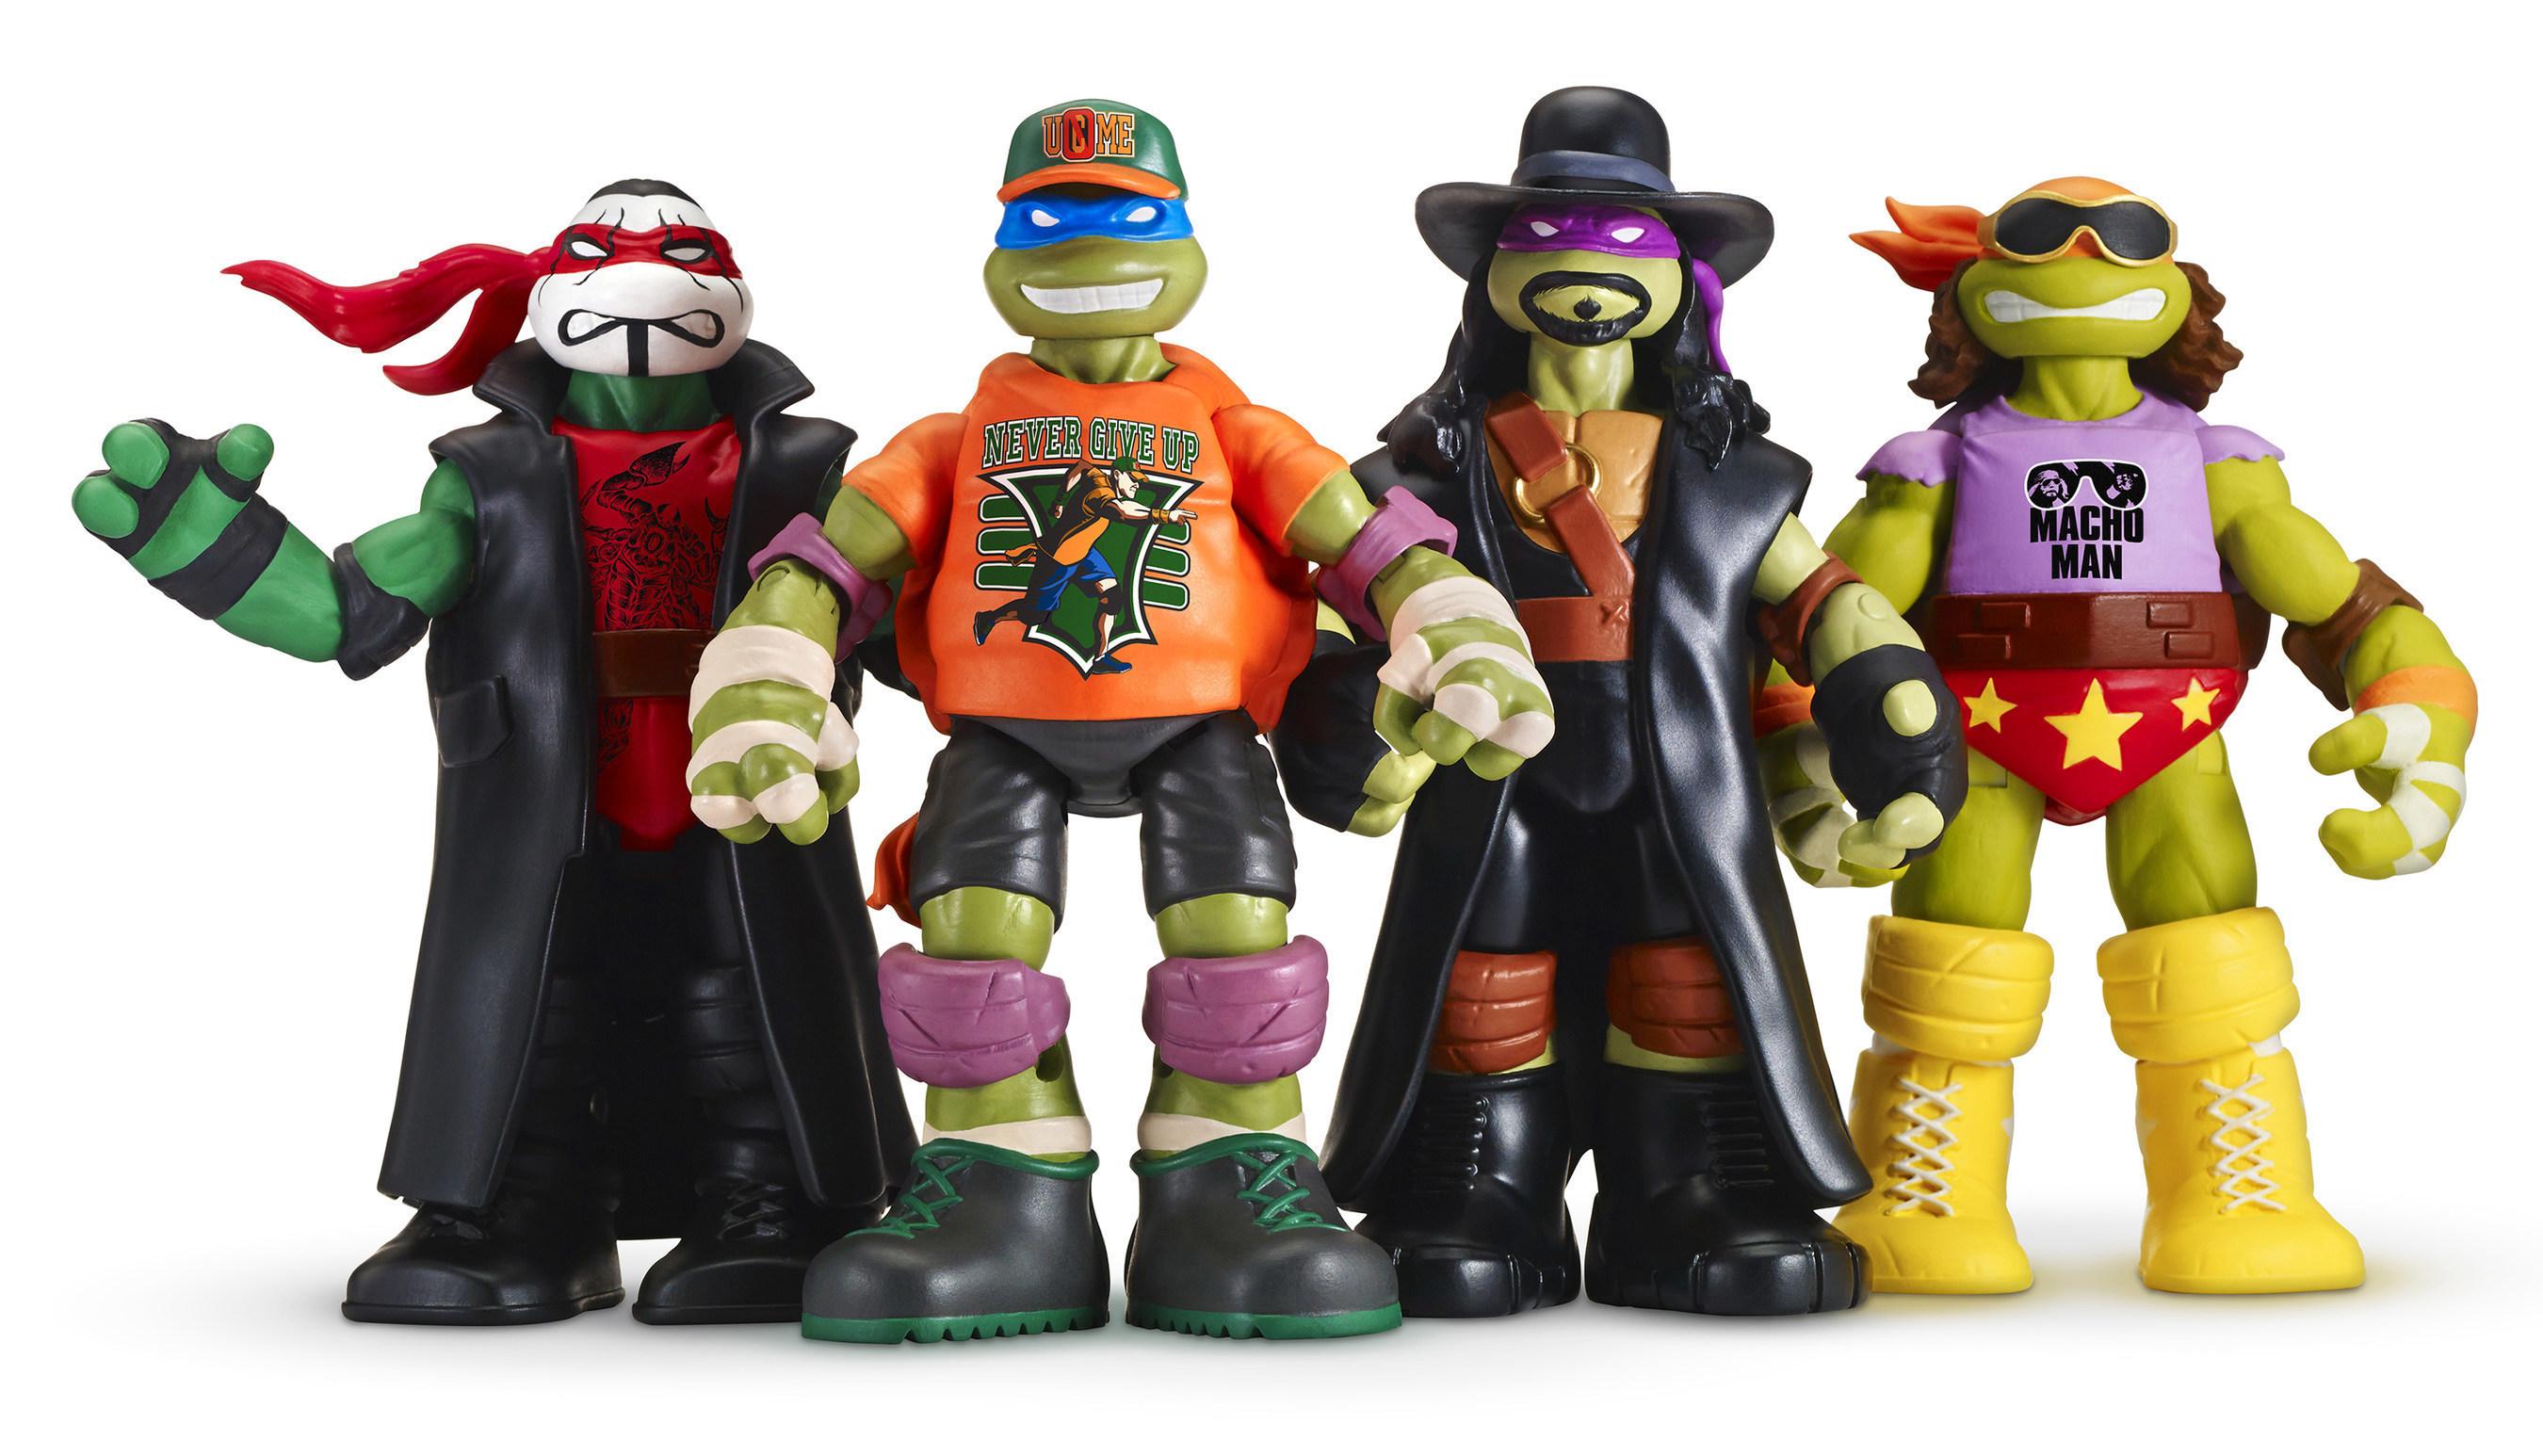 Teenage Mutant Ninja Turtles And WWE Team Up For The Ultimate Sewer Slam